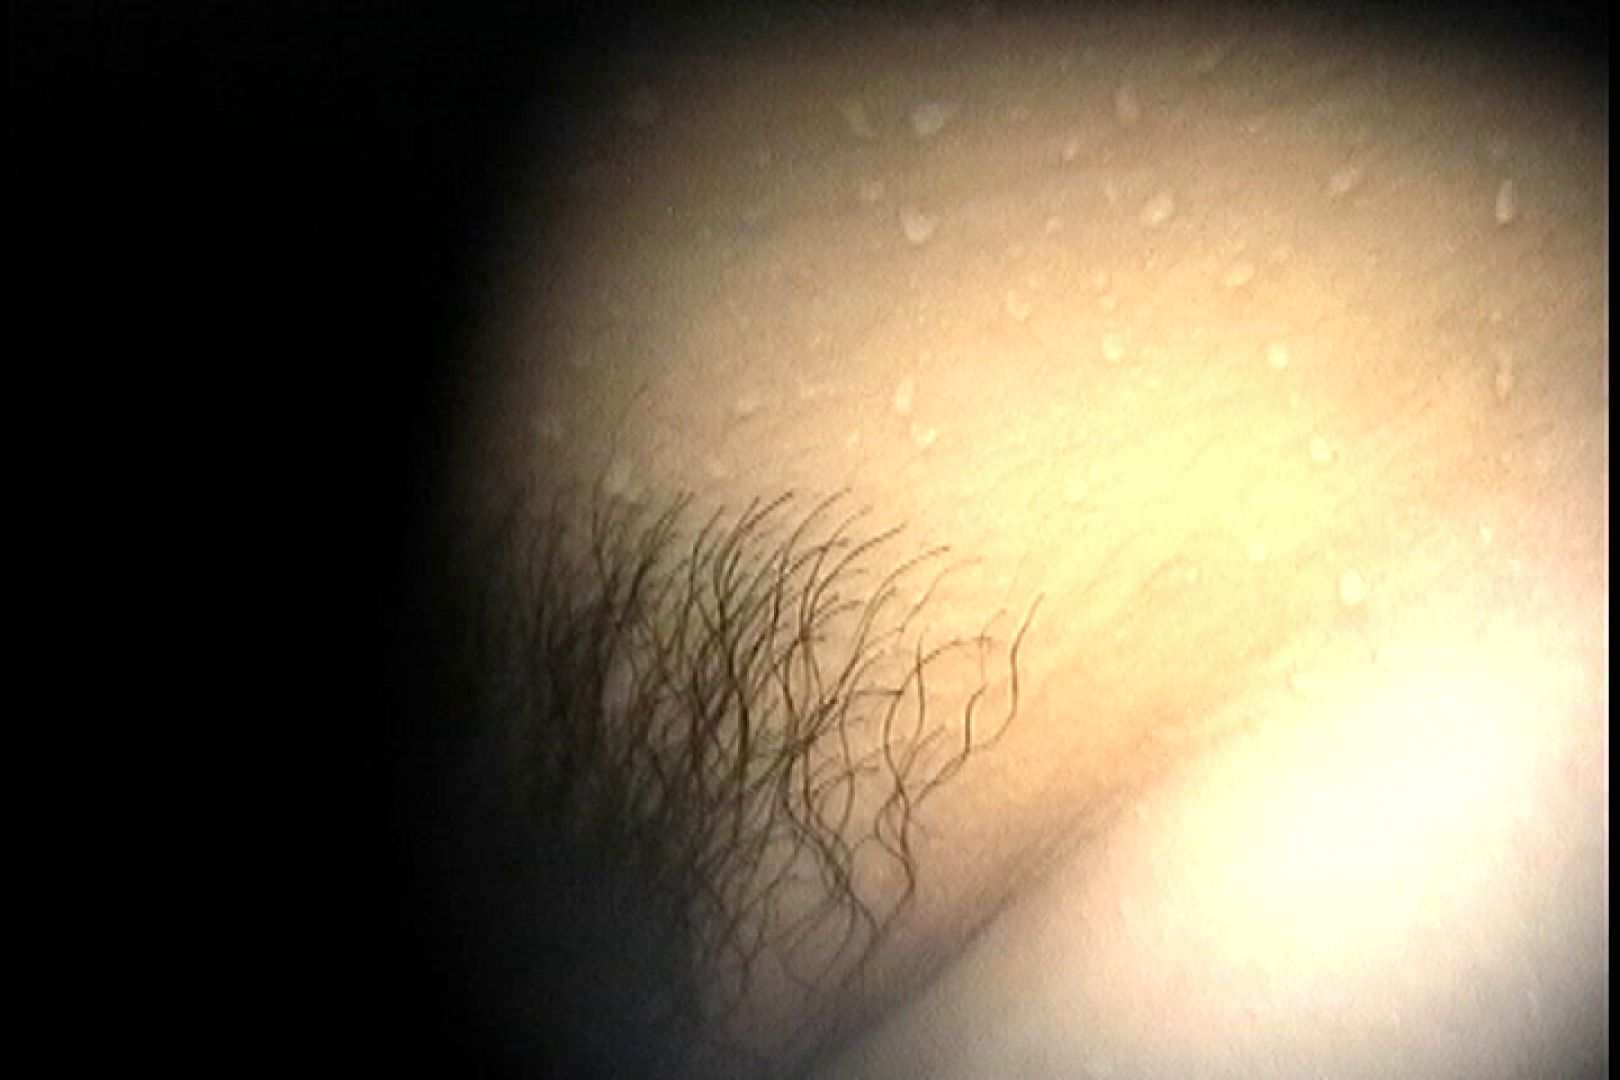 No.41 陰茎から滴り落ちる水滴 細身体型  108枚 91